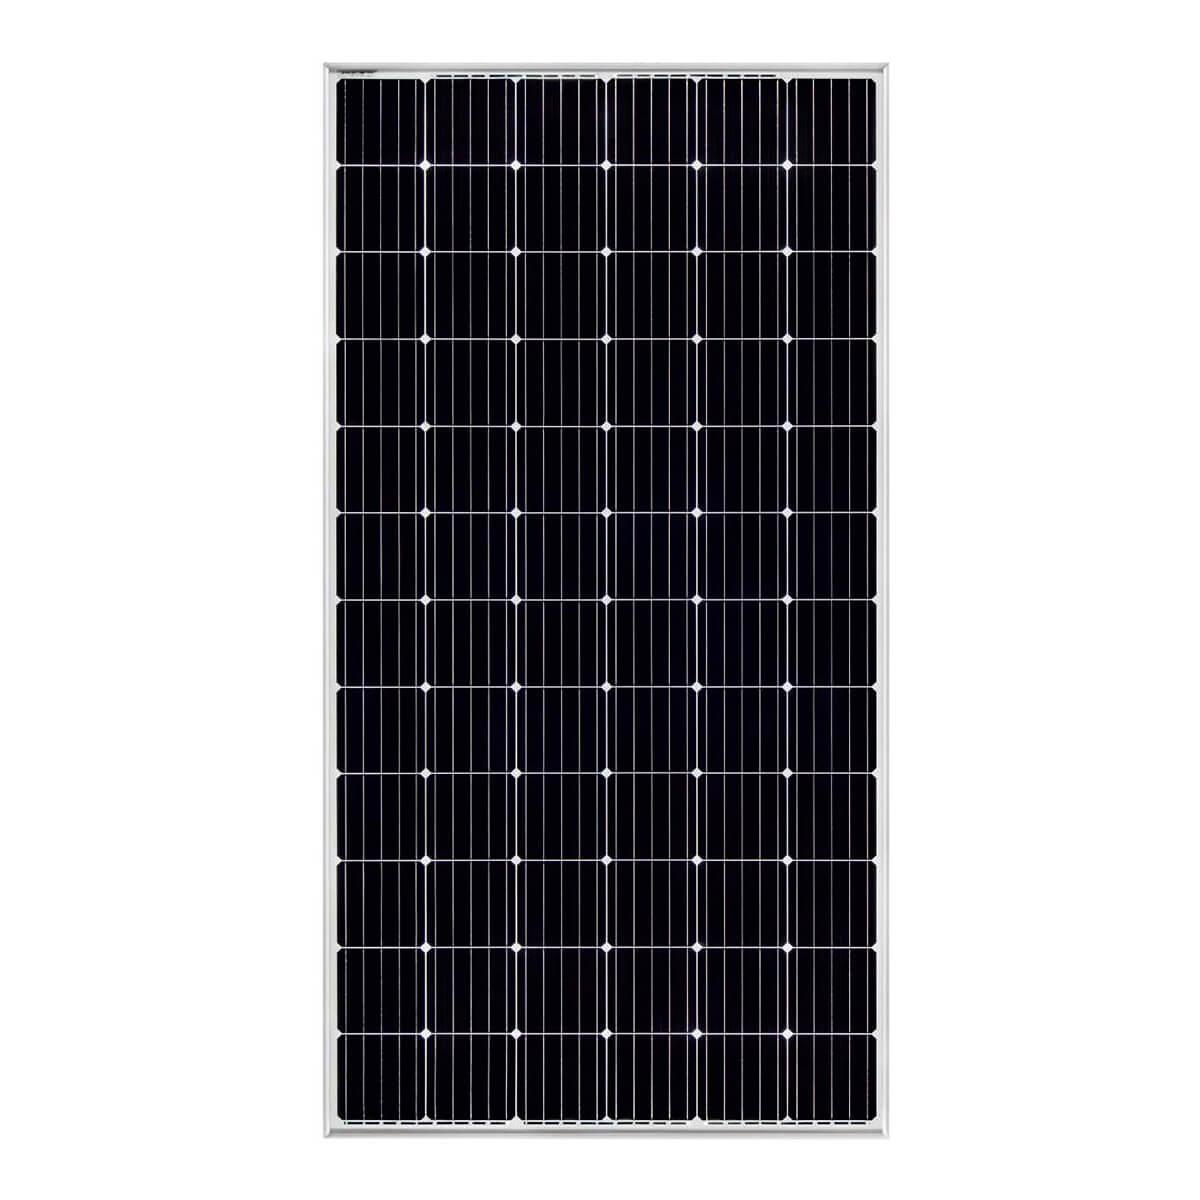 Odul solar 380W panel, odul solar 380Watt panel, Odul solar 380 W panel, odul solar 380 Watt panel, odul solar 380 Watt monokristal panel, Odul solar 380 W watt gunes paneli, odul solar 380 W watt monokristal gunes paneli, odul solar 380 W Watt fotovoltaik monokristal solar panel, odul solar 380W monokristal gunes enerjisi, odul solar OSMp72-380W panel, ÖDÜL SOLAR 380 WATT